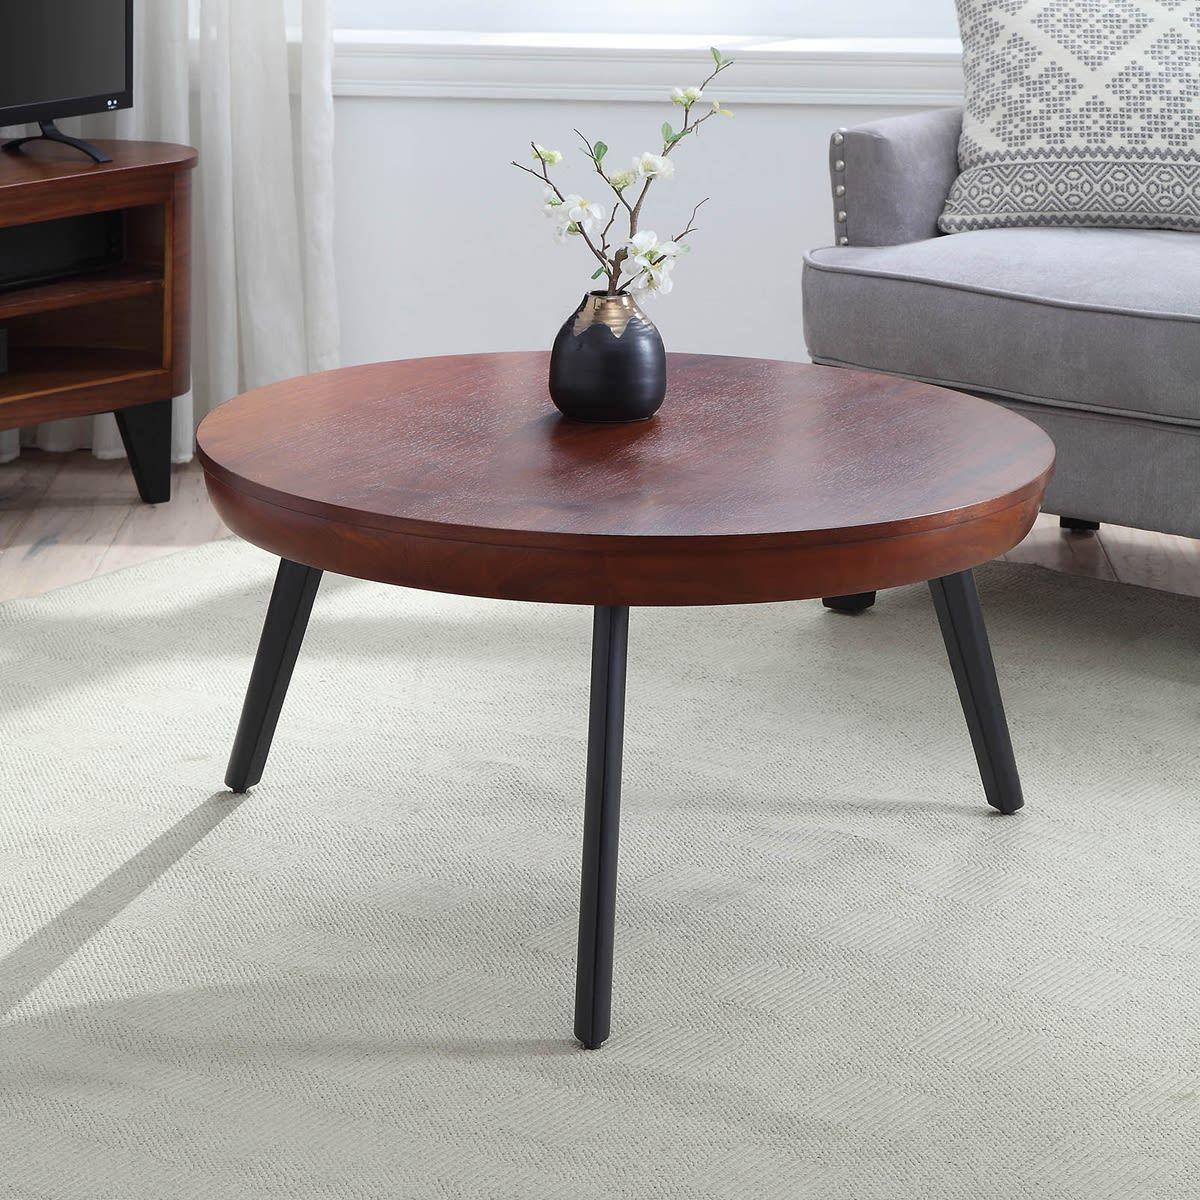 15+ Walnut coffee table uk ideas